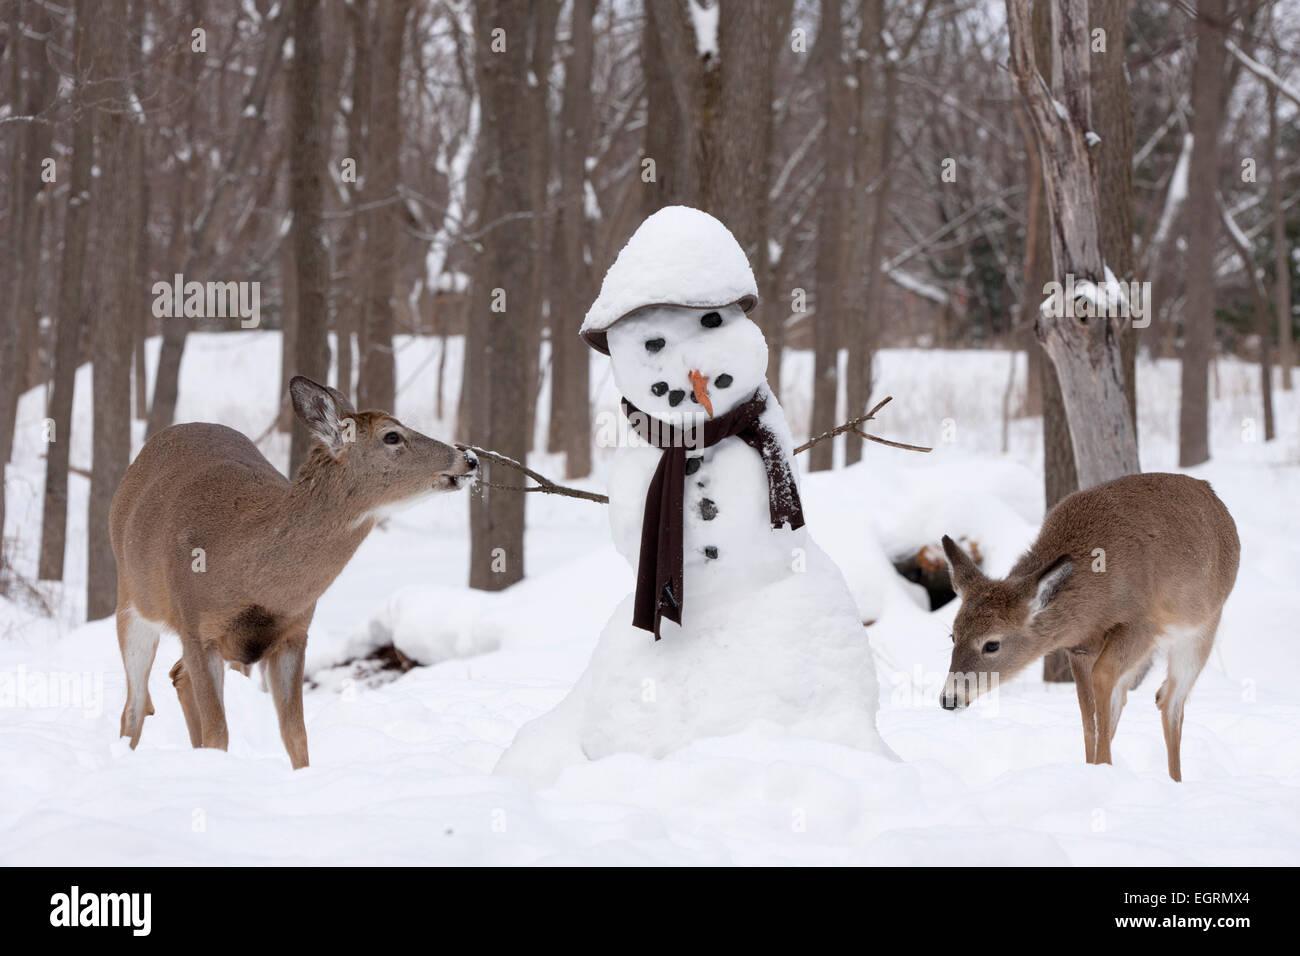 White-tailed deer (Odocoileus virginianus), investigating snowman, New York - Stock Image